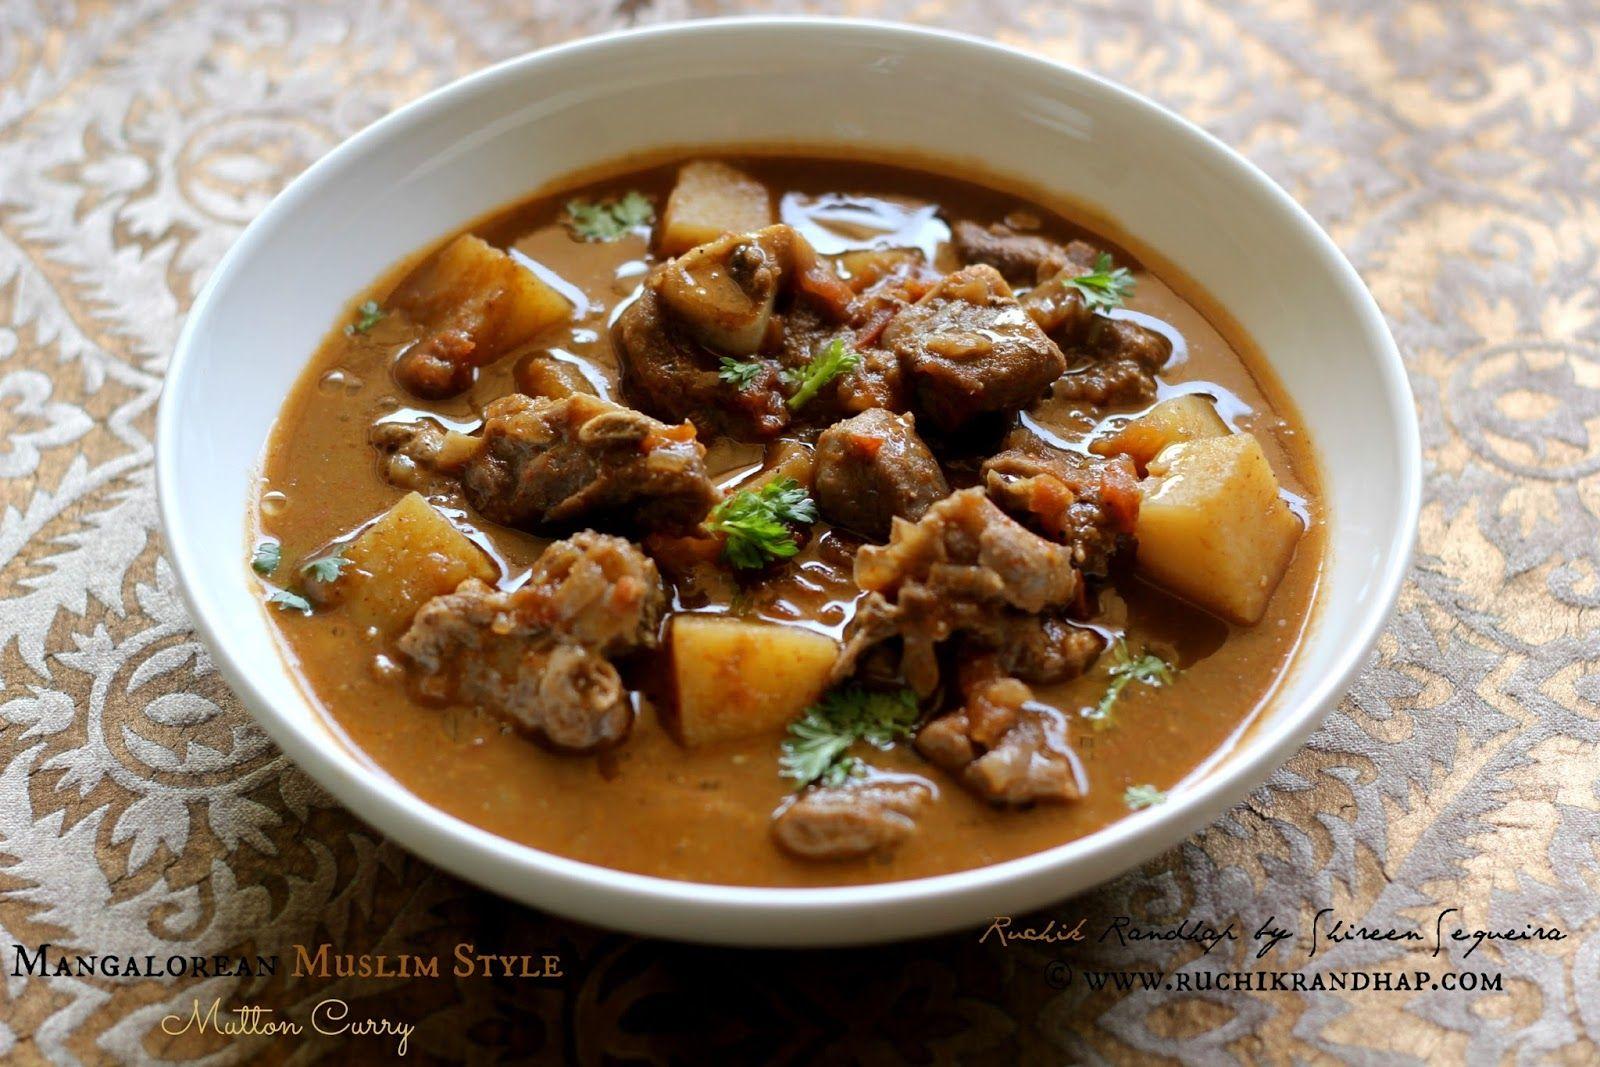 Mutton Stew Mangalorean Muslim Style Ruchik Randhap Indian Food Recipes Mutton Curry Recipe Recipes